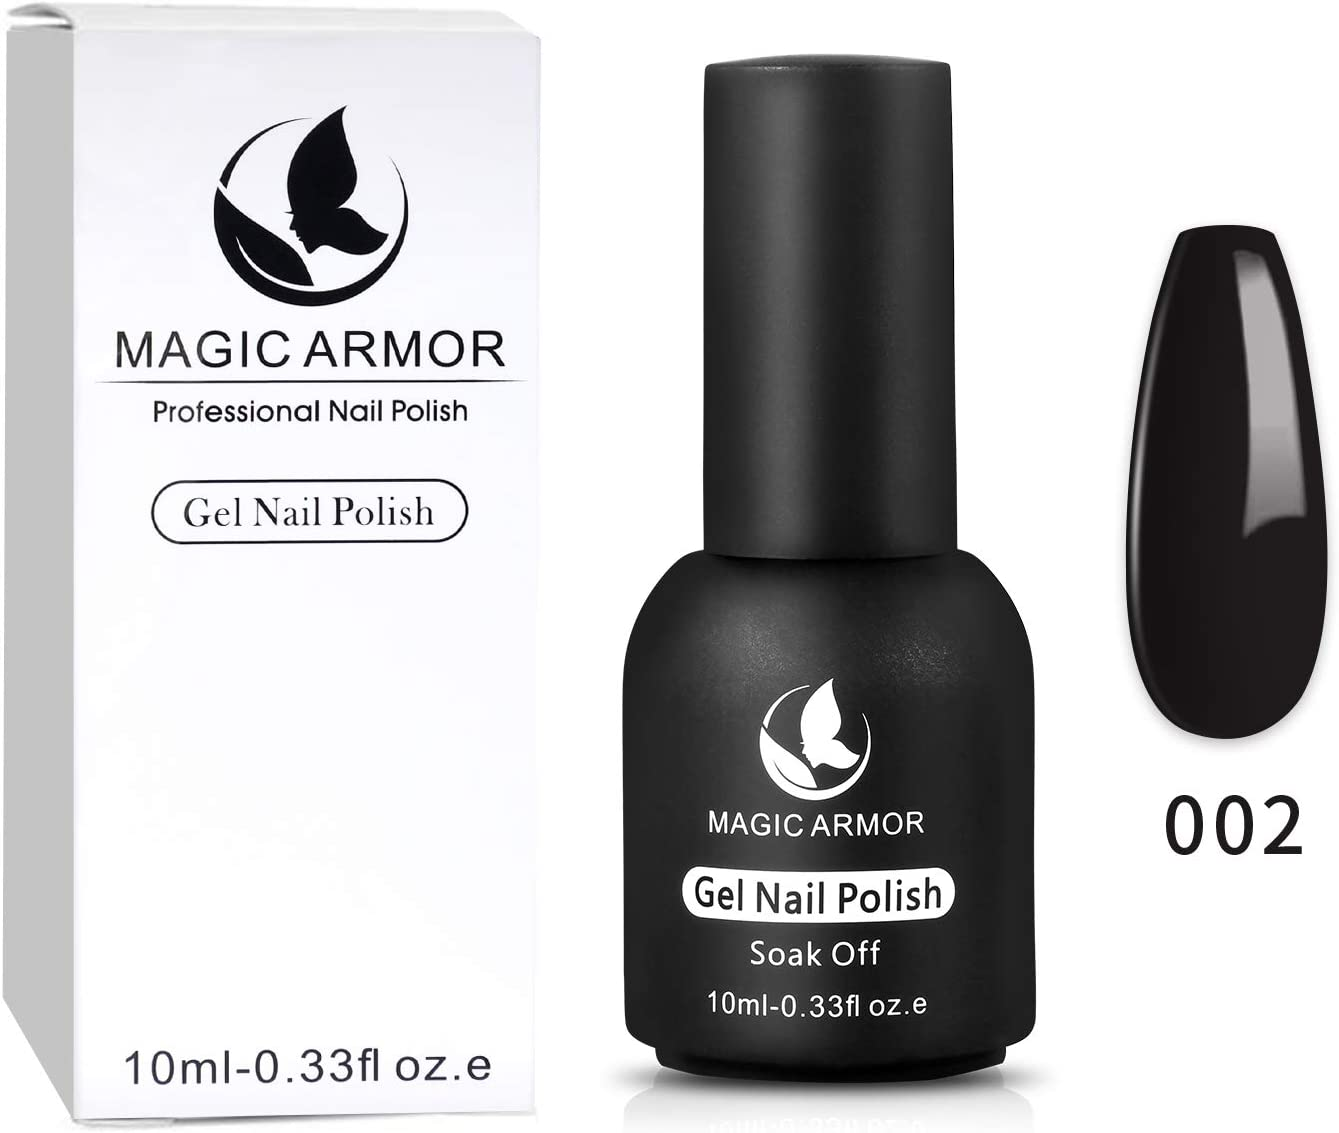 MAGIC ARMOR Gel Nail Polish Black Soak Off UV Gel Polish Nail Art Salon Manicure Nail Lacquer Varnish 10ml (002): Health & Personal Care